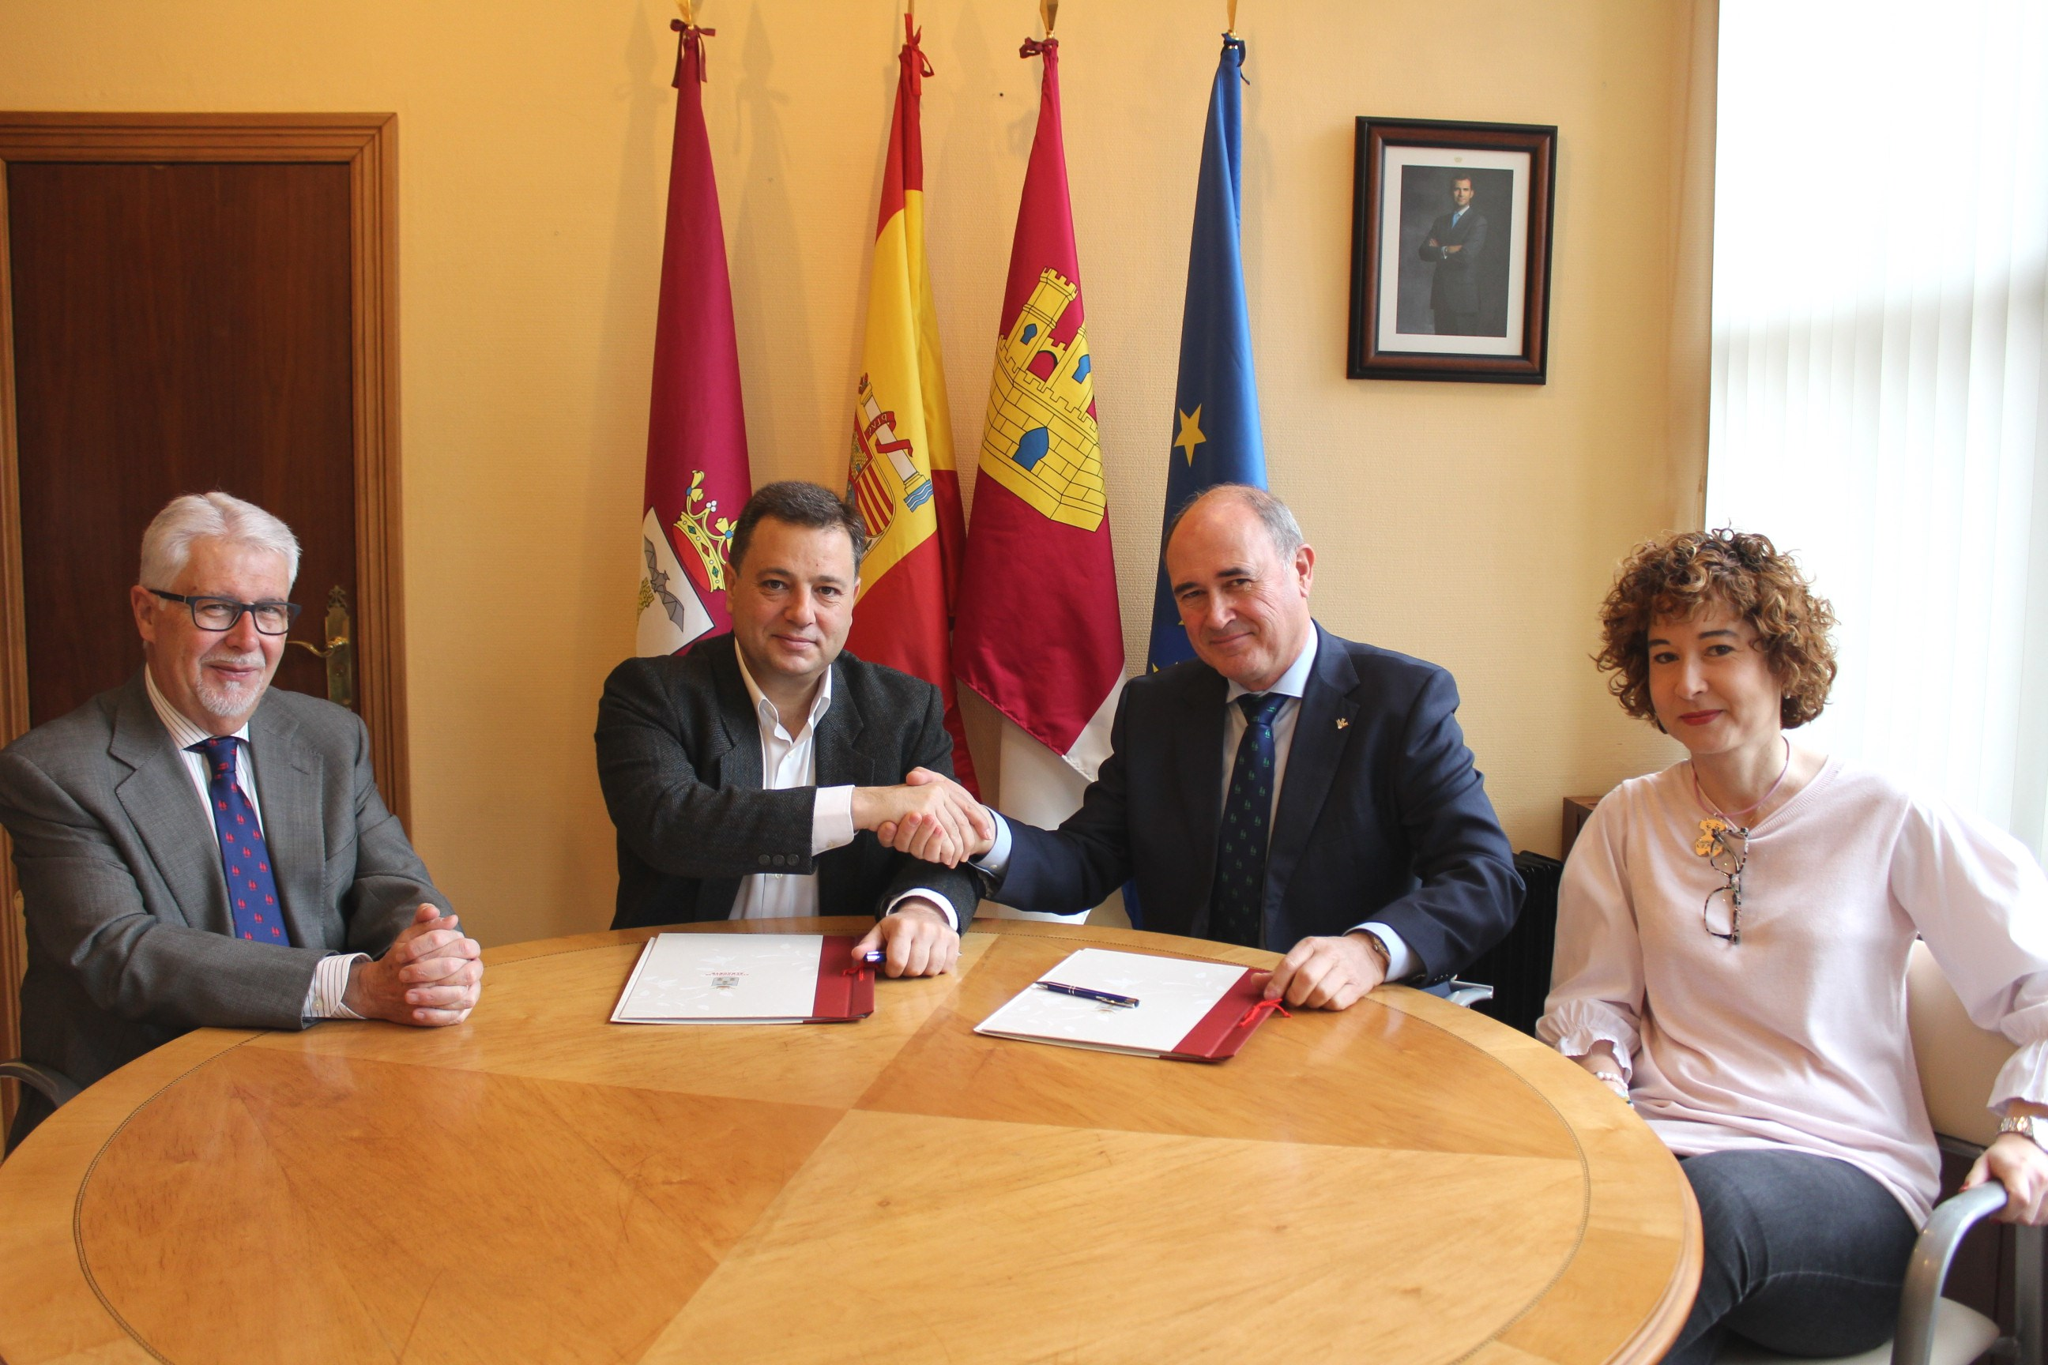 https://blog.globalcaja.es/wp-content/uploads/2019/04/Foto.Firma-convenio-Fundación-Globalcaja-Albacete-2.jpg